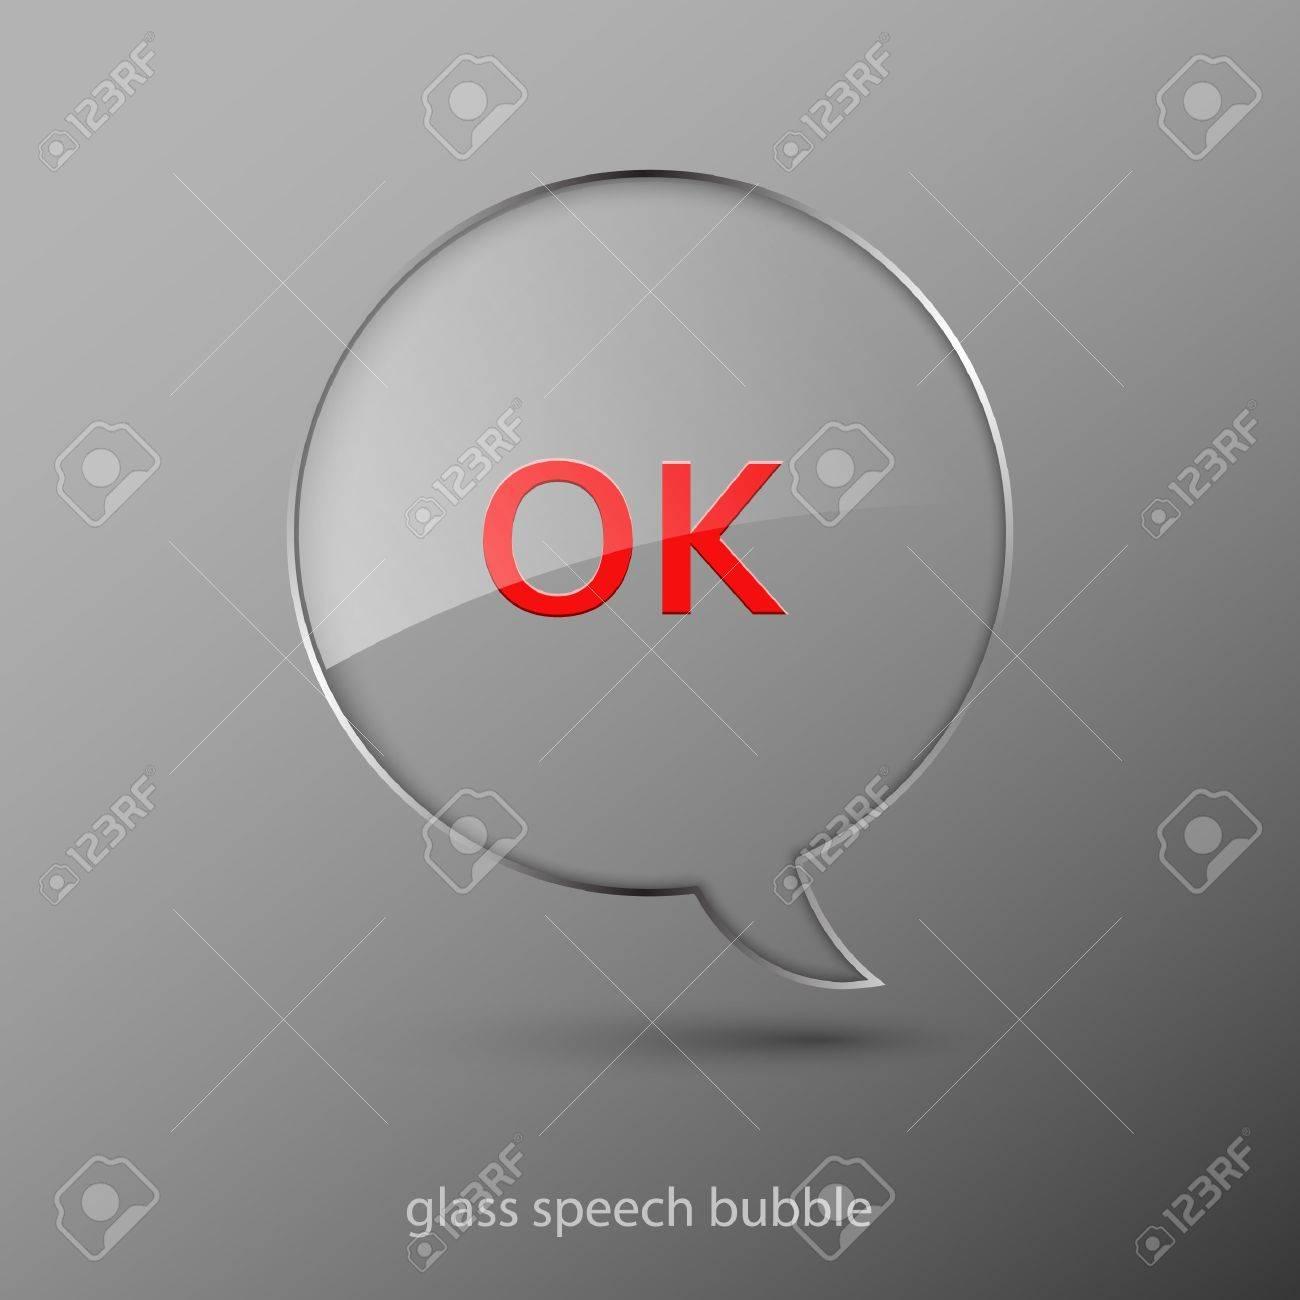 Realistic glass speech bubble. Stock Vector - 9636547